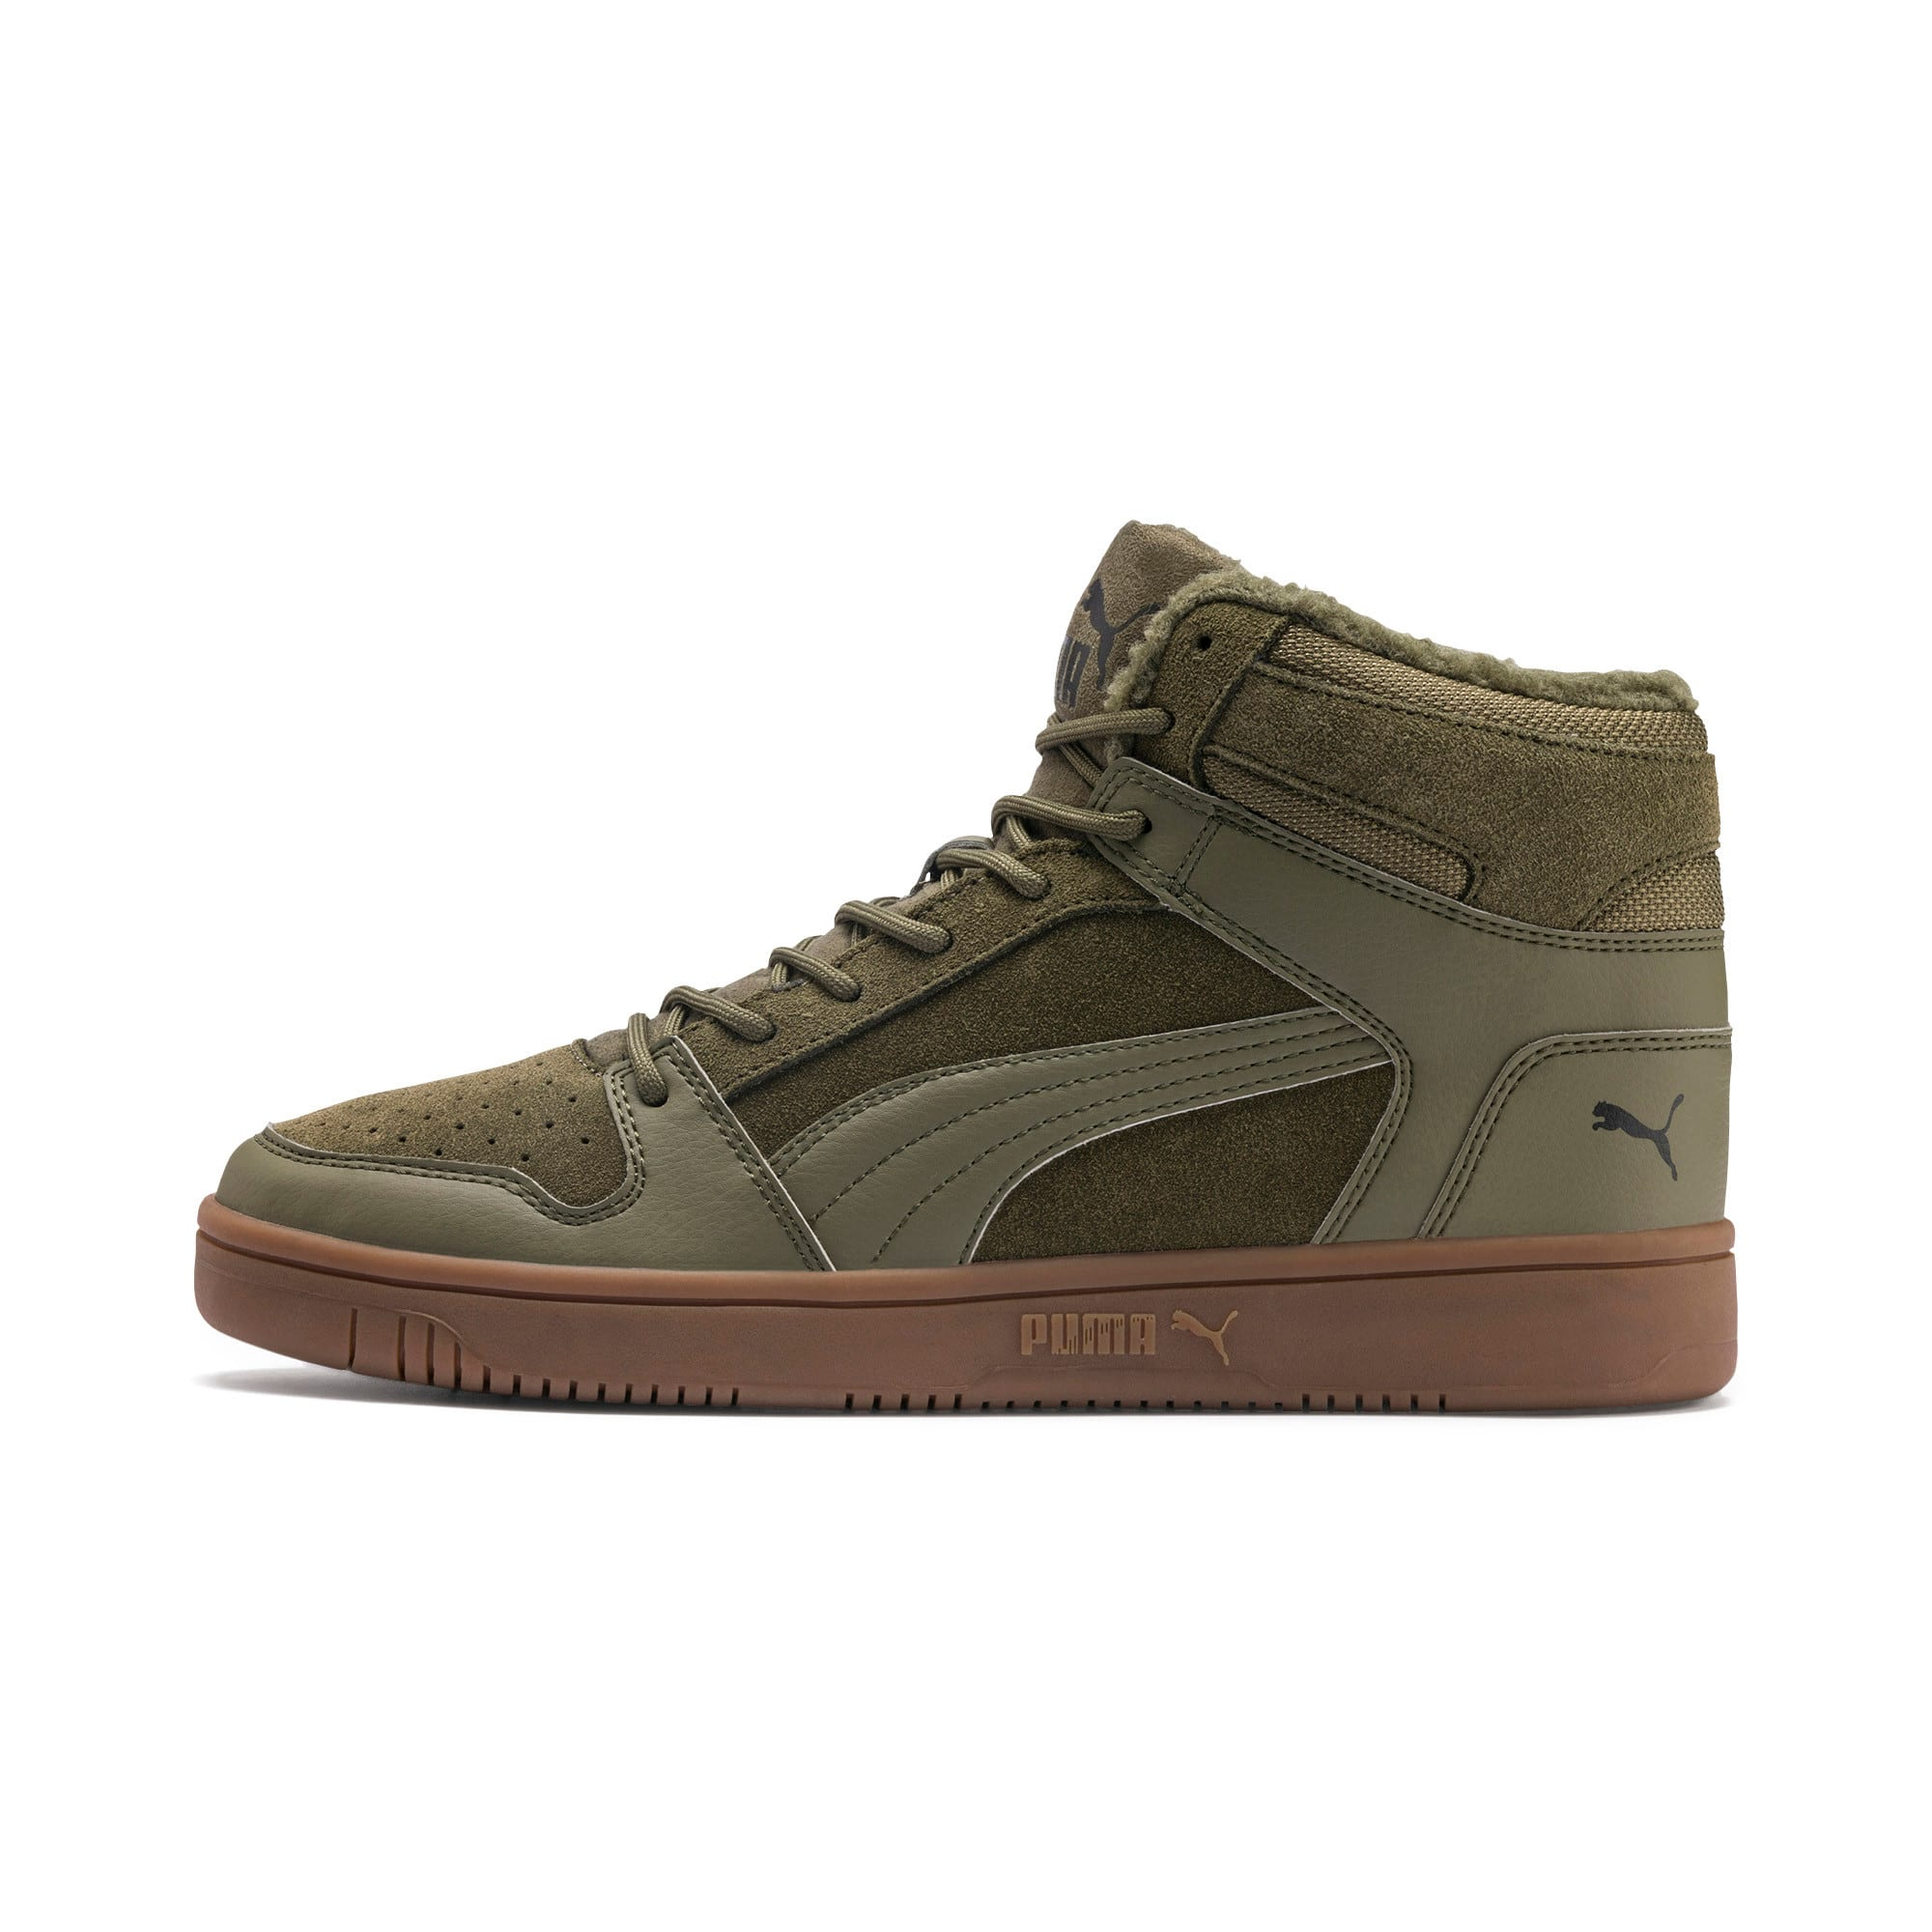 Thumbnail 1 of Rebound Lay Up SD Fur Sneaker, Burnt Olive-Puma Black-Gum, medium